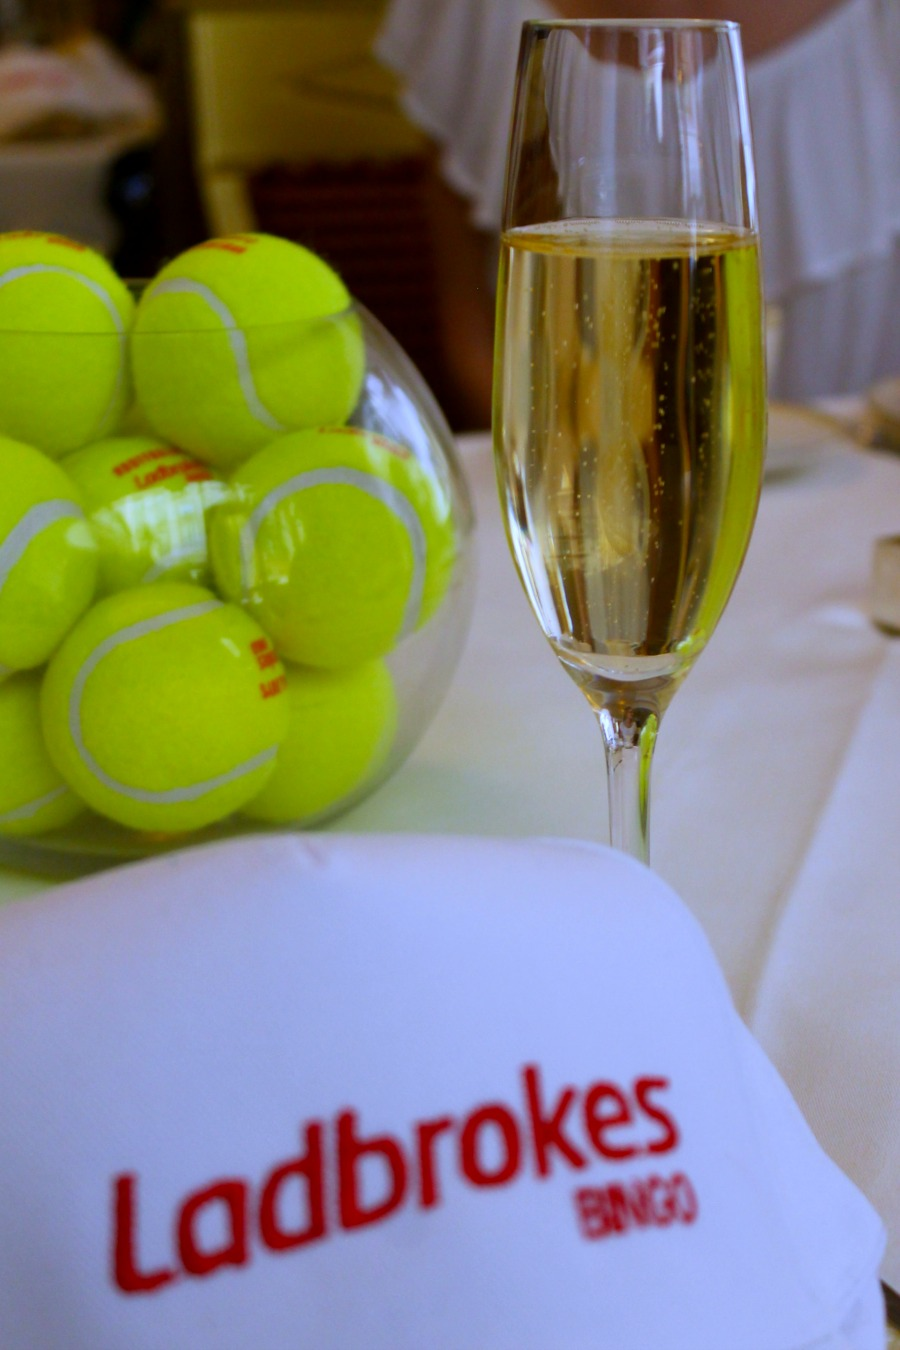 Wimbledon-themed Afternoon Tea by Ladbrokes